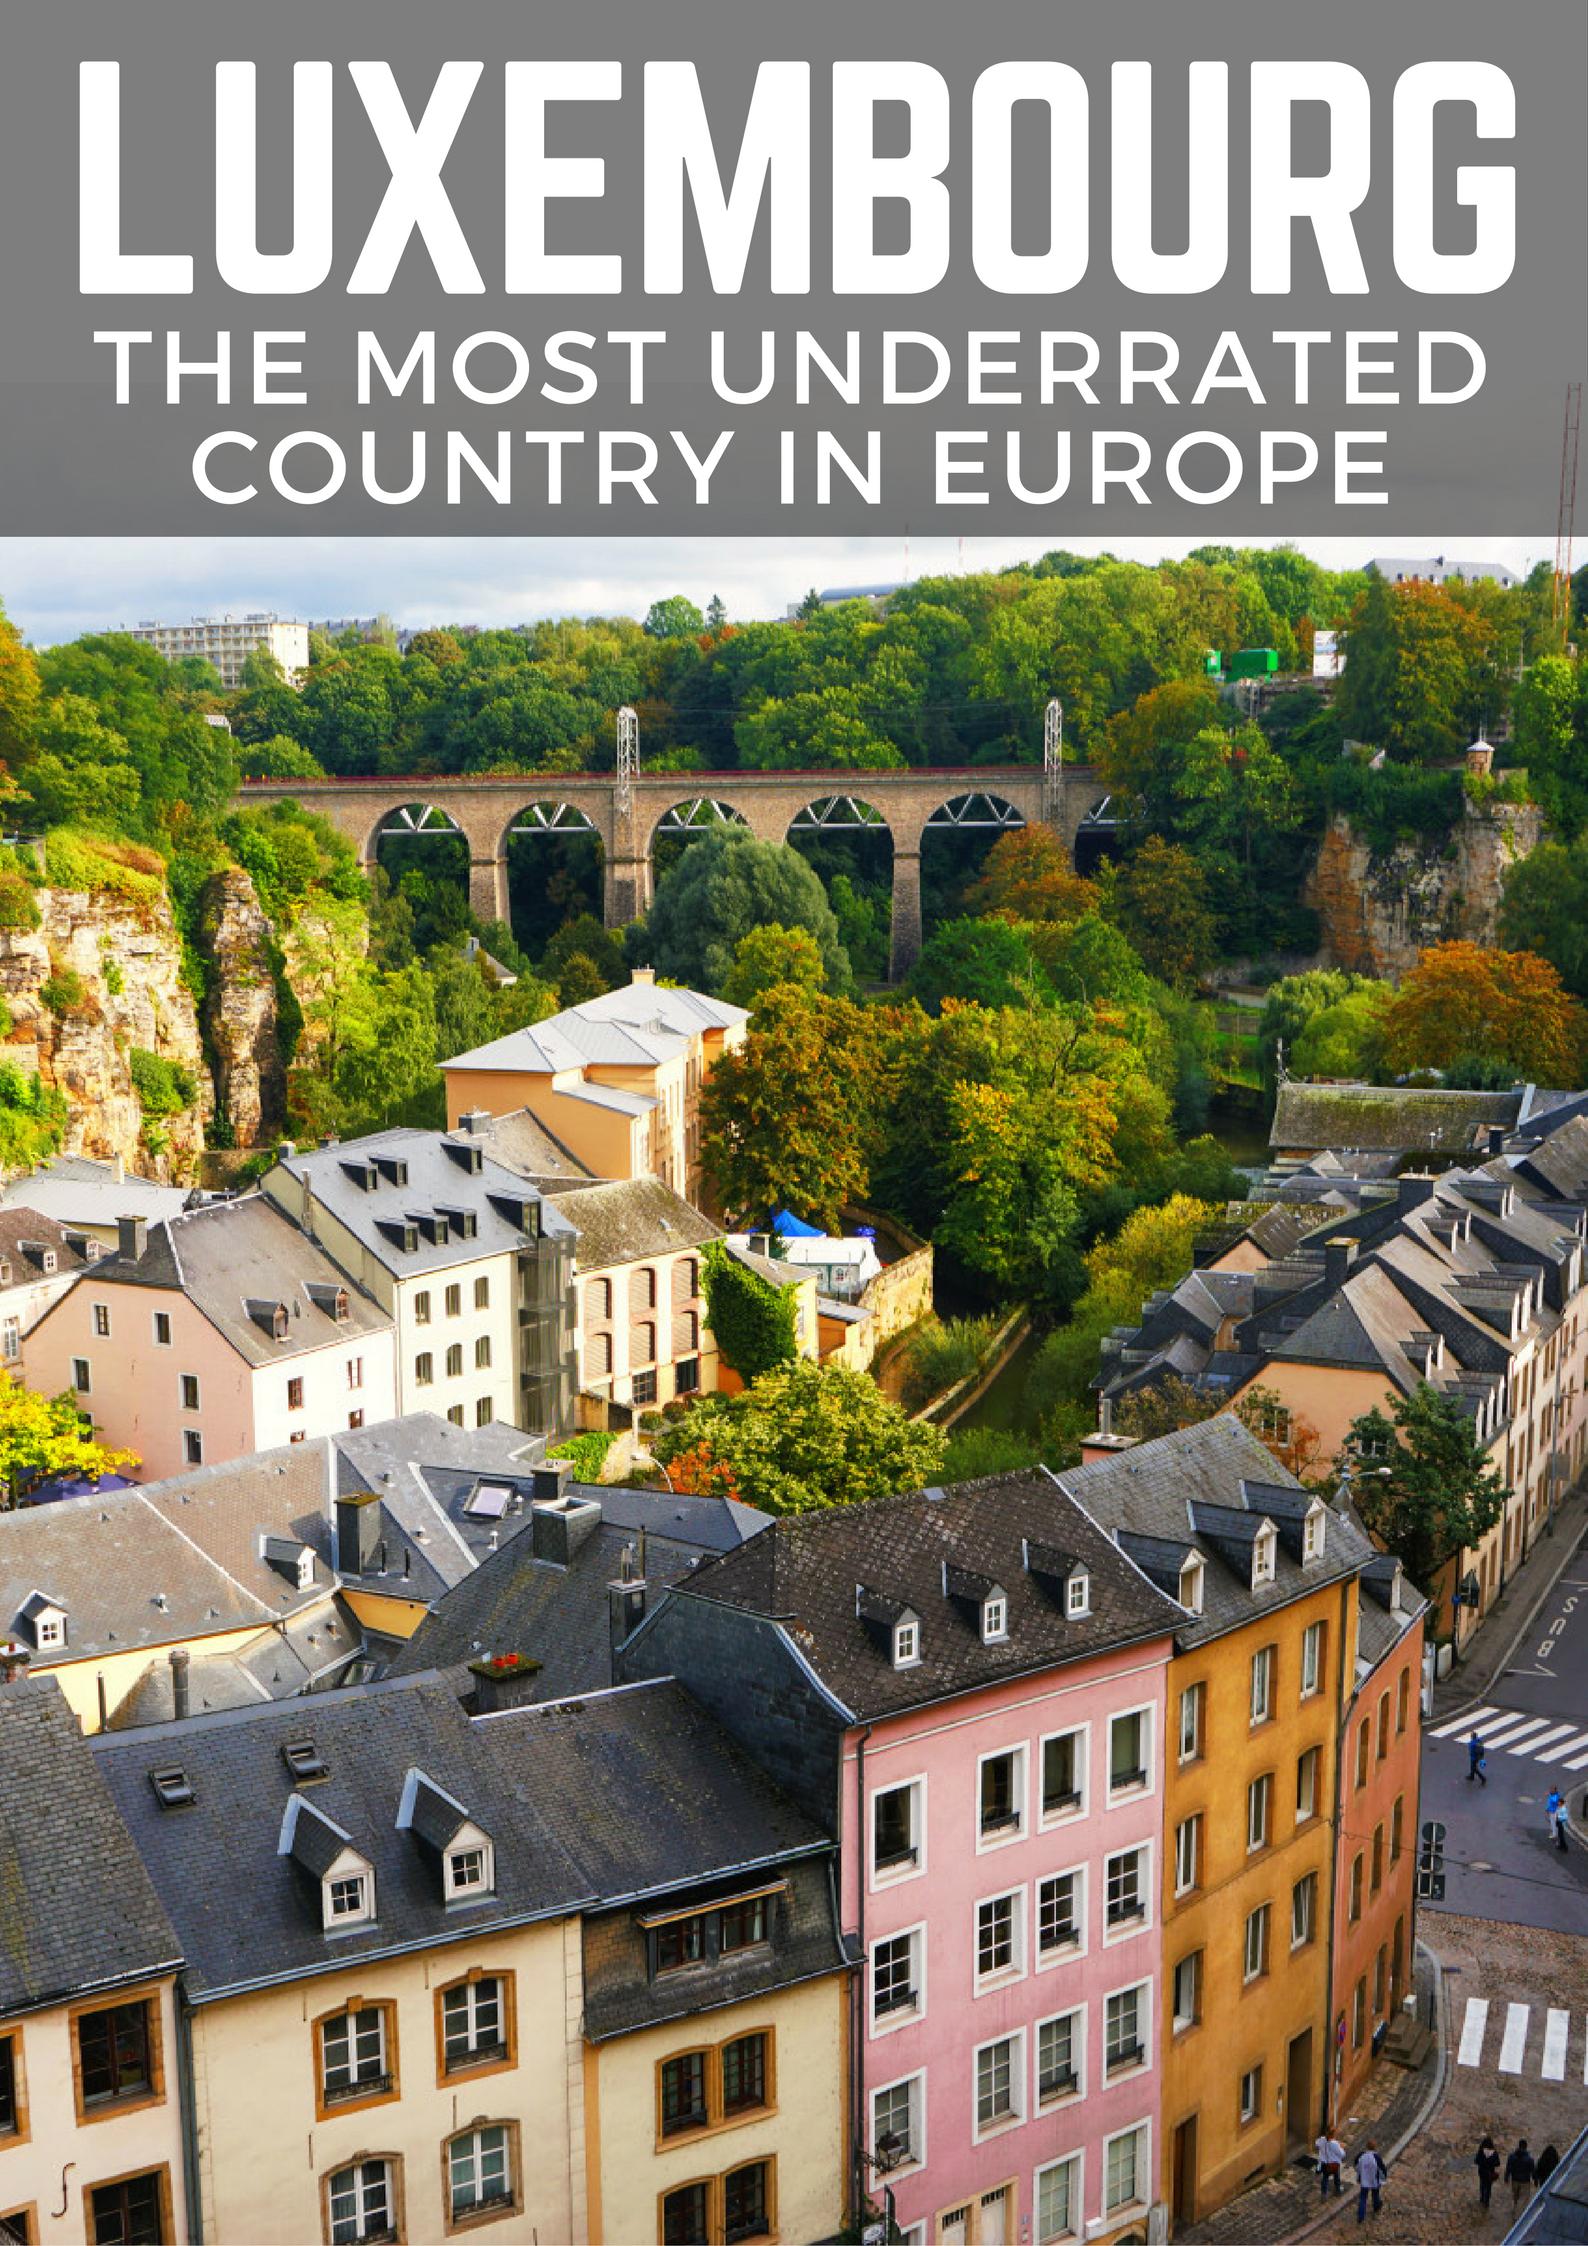 Best 25 Luxembourg Germany Ideas On Pinterest Luxemburg Country Luxembourg And Luxemburg City